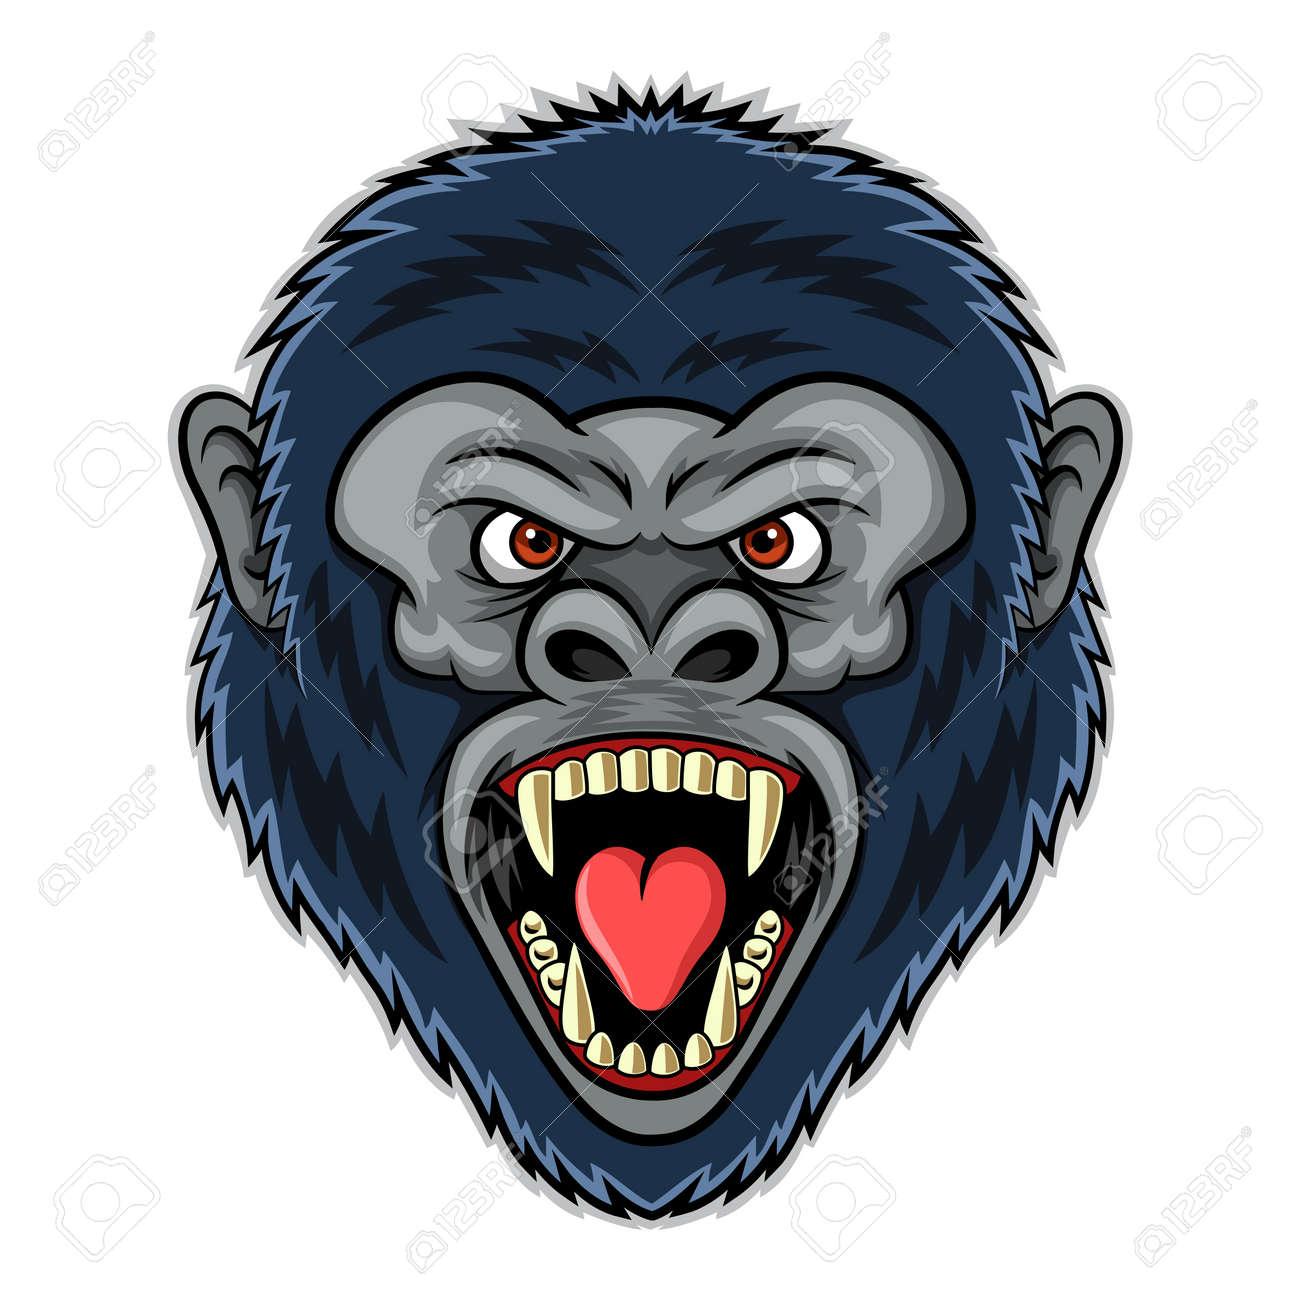 Mascot of angry gorilla head. Illustration - 139004818